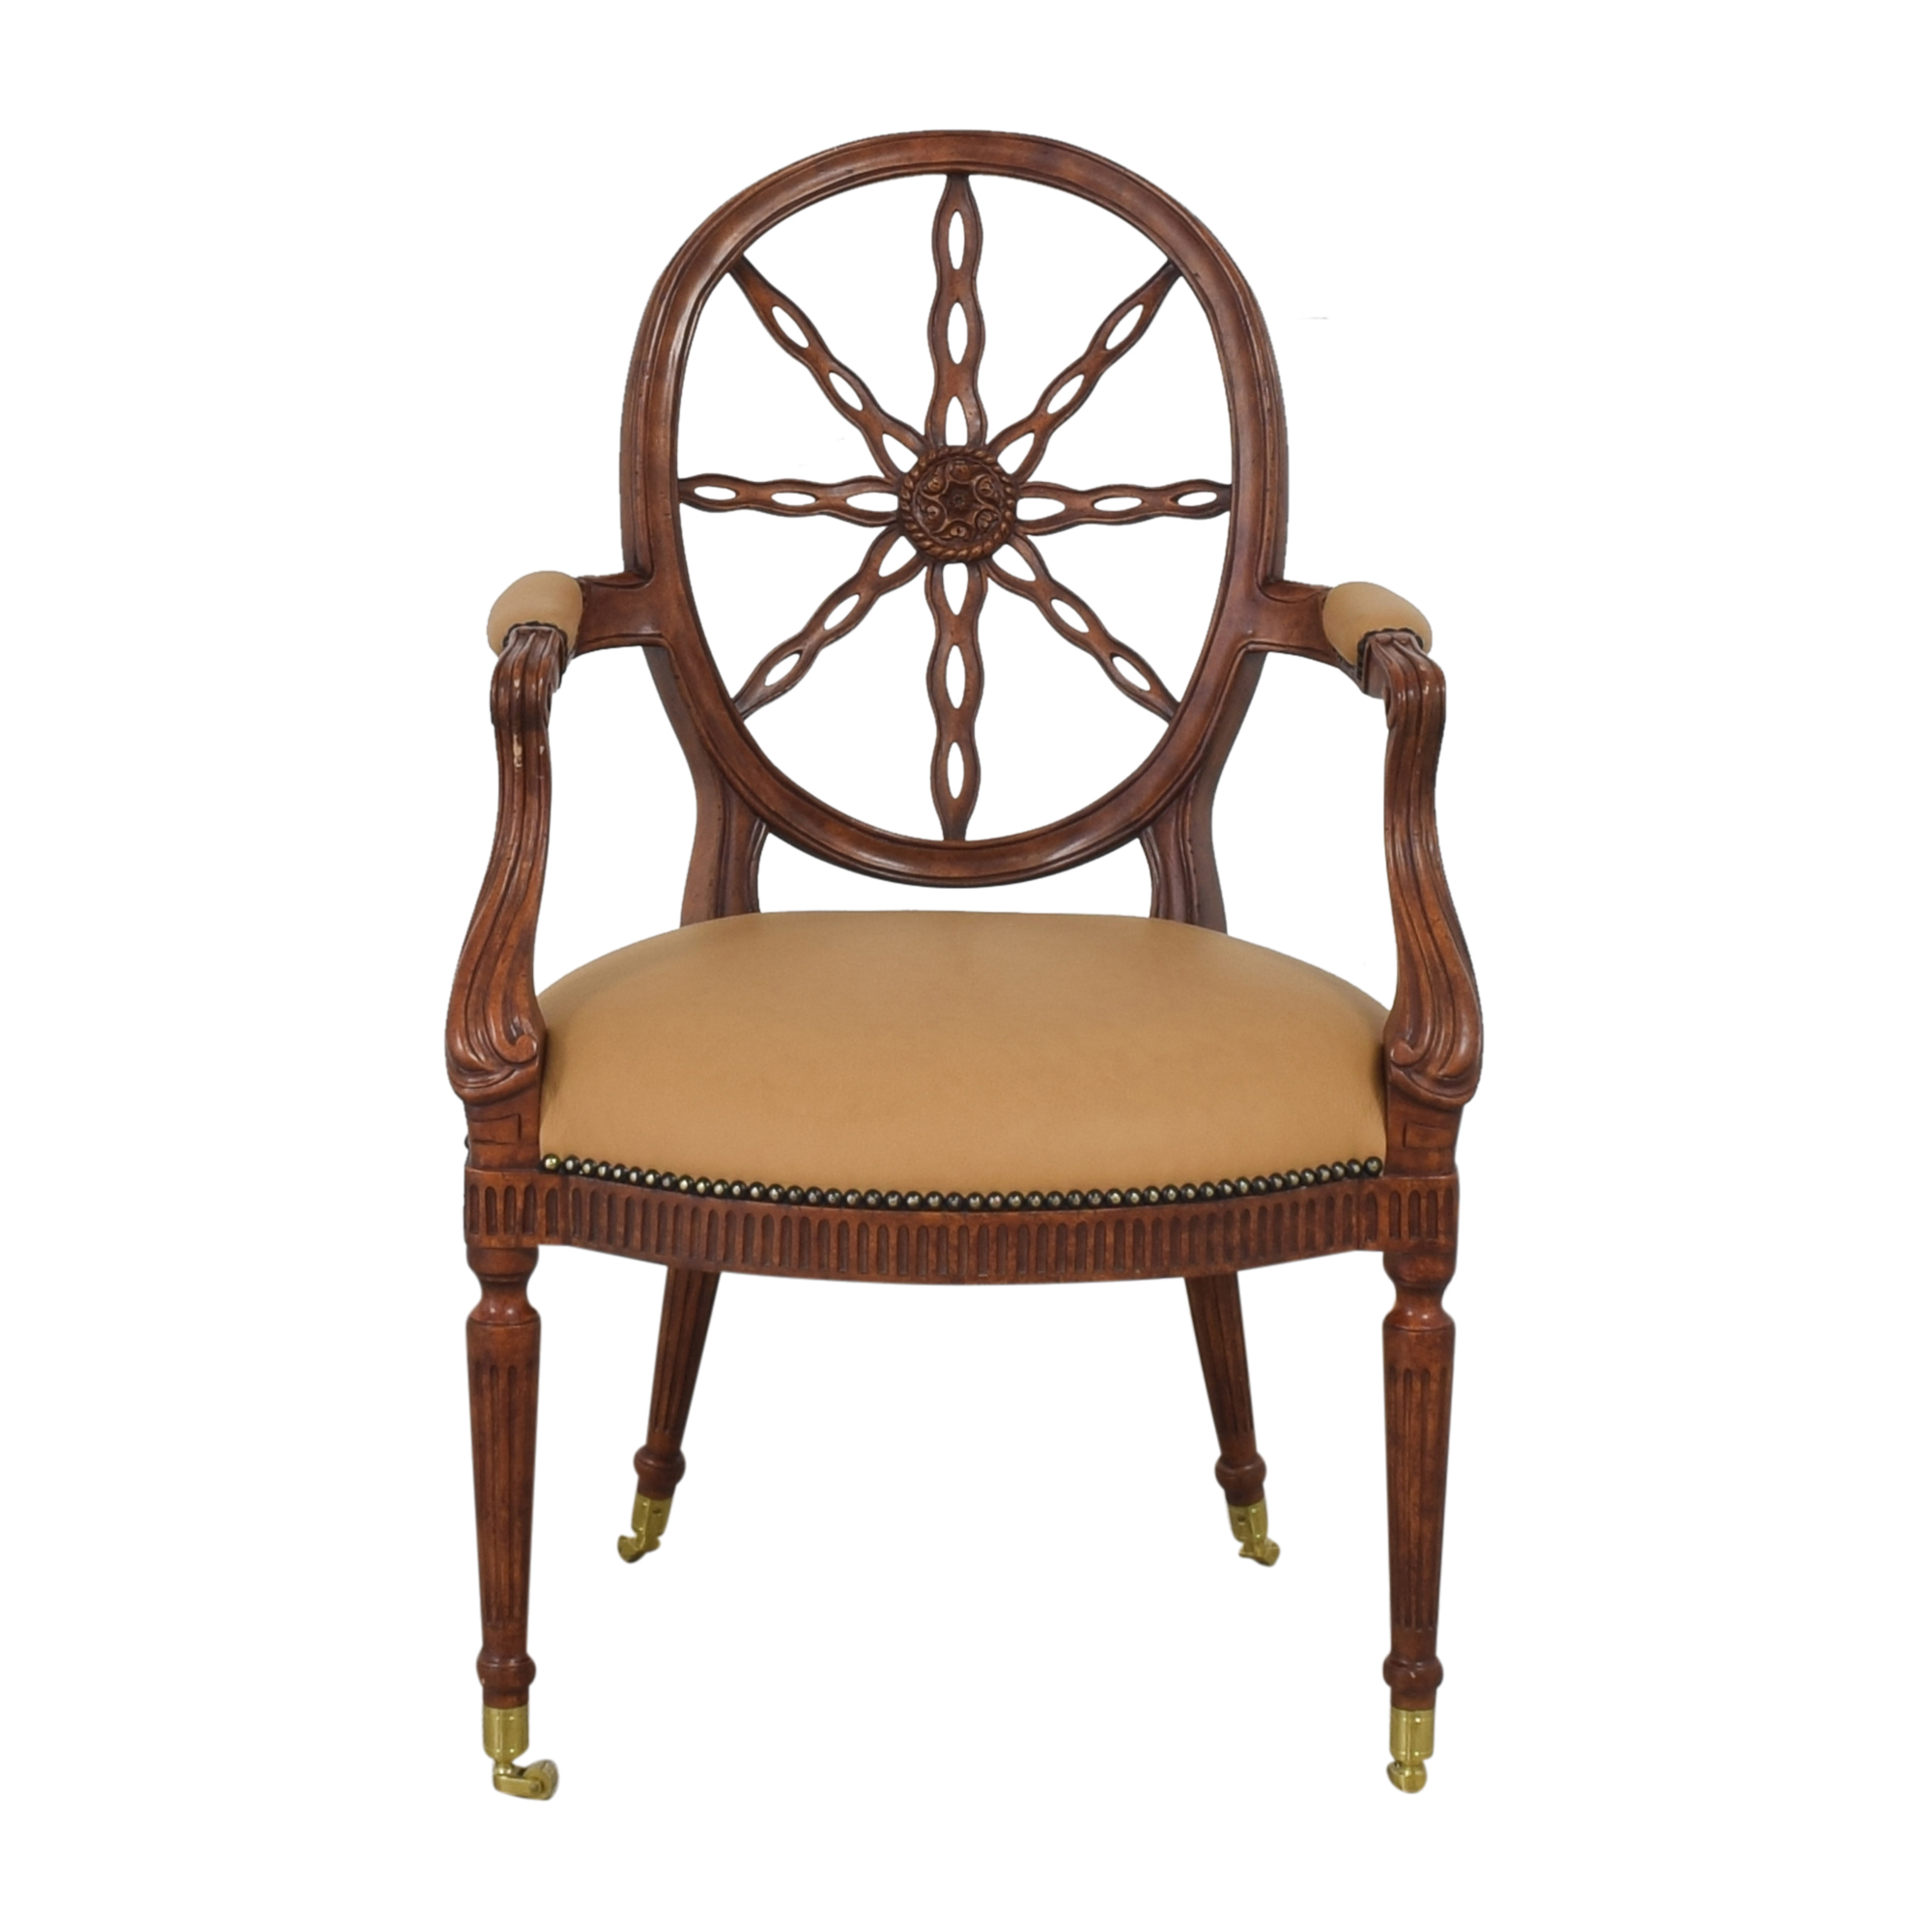 Maitland-Smith Maitland-Smith Sheraton-Style Wheel Back Arm Chair dimensions